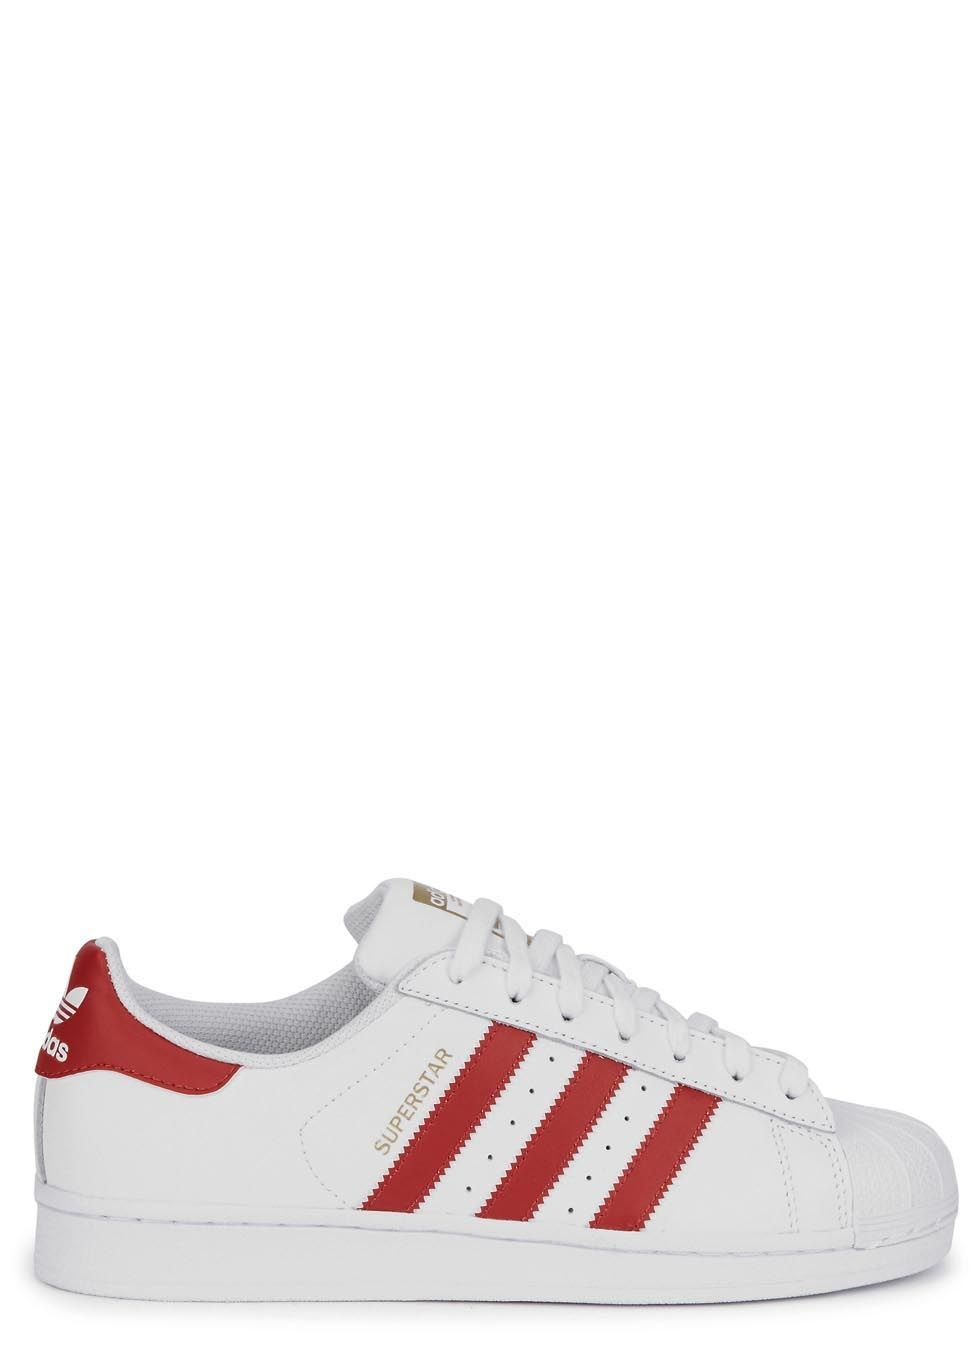 White leather shoes, Adidas originals